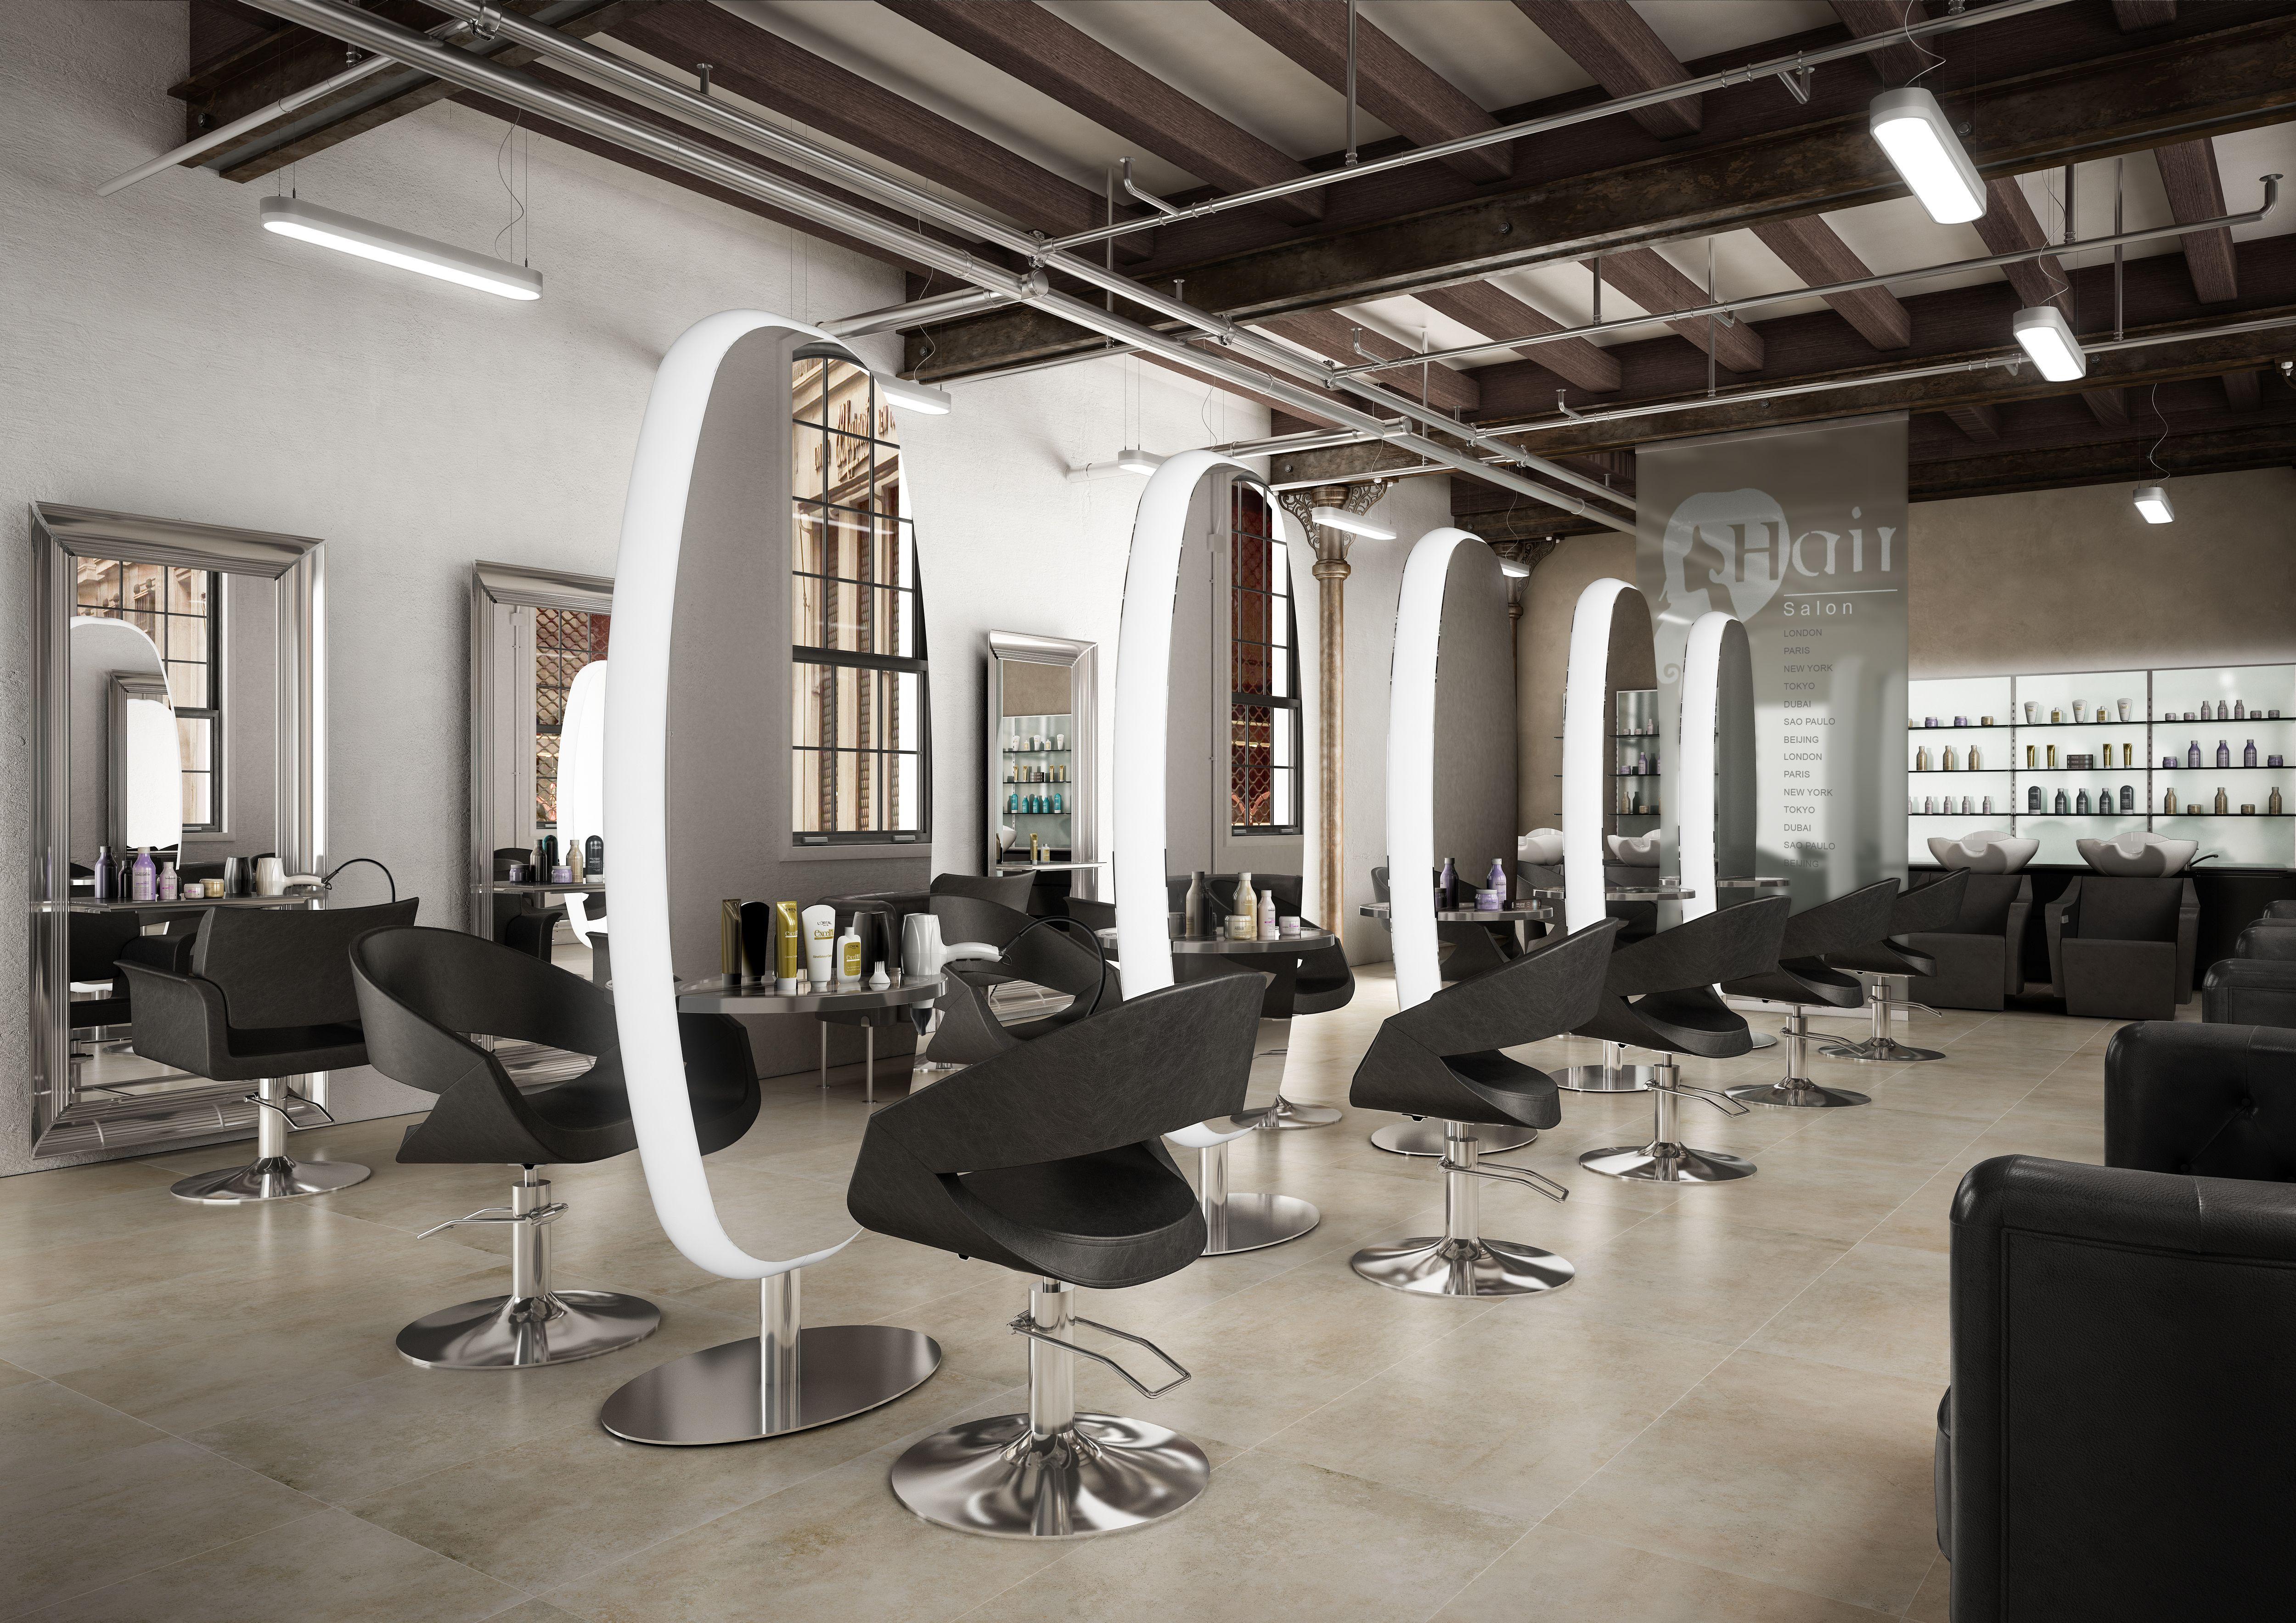 10+ Fauteuil salon de coiffure inspiration